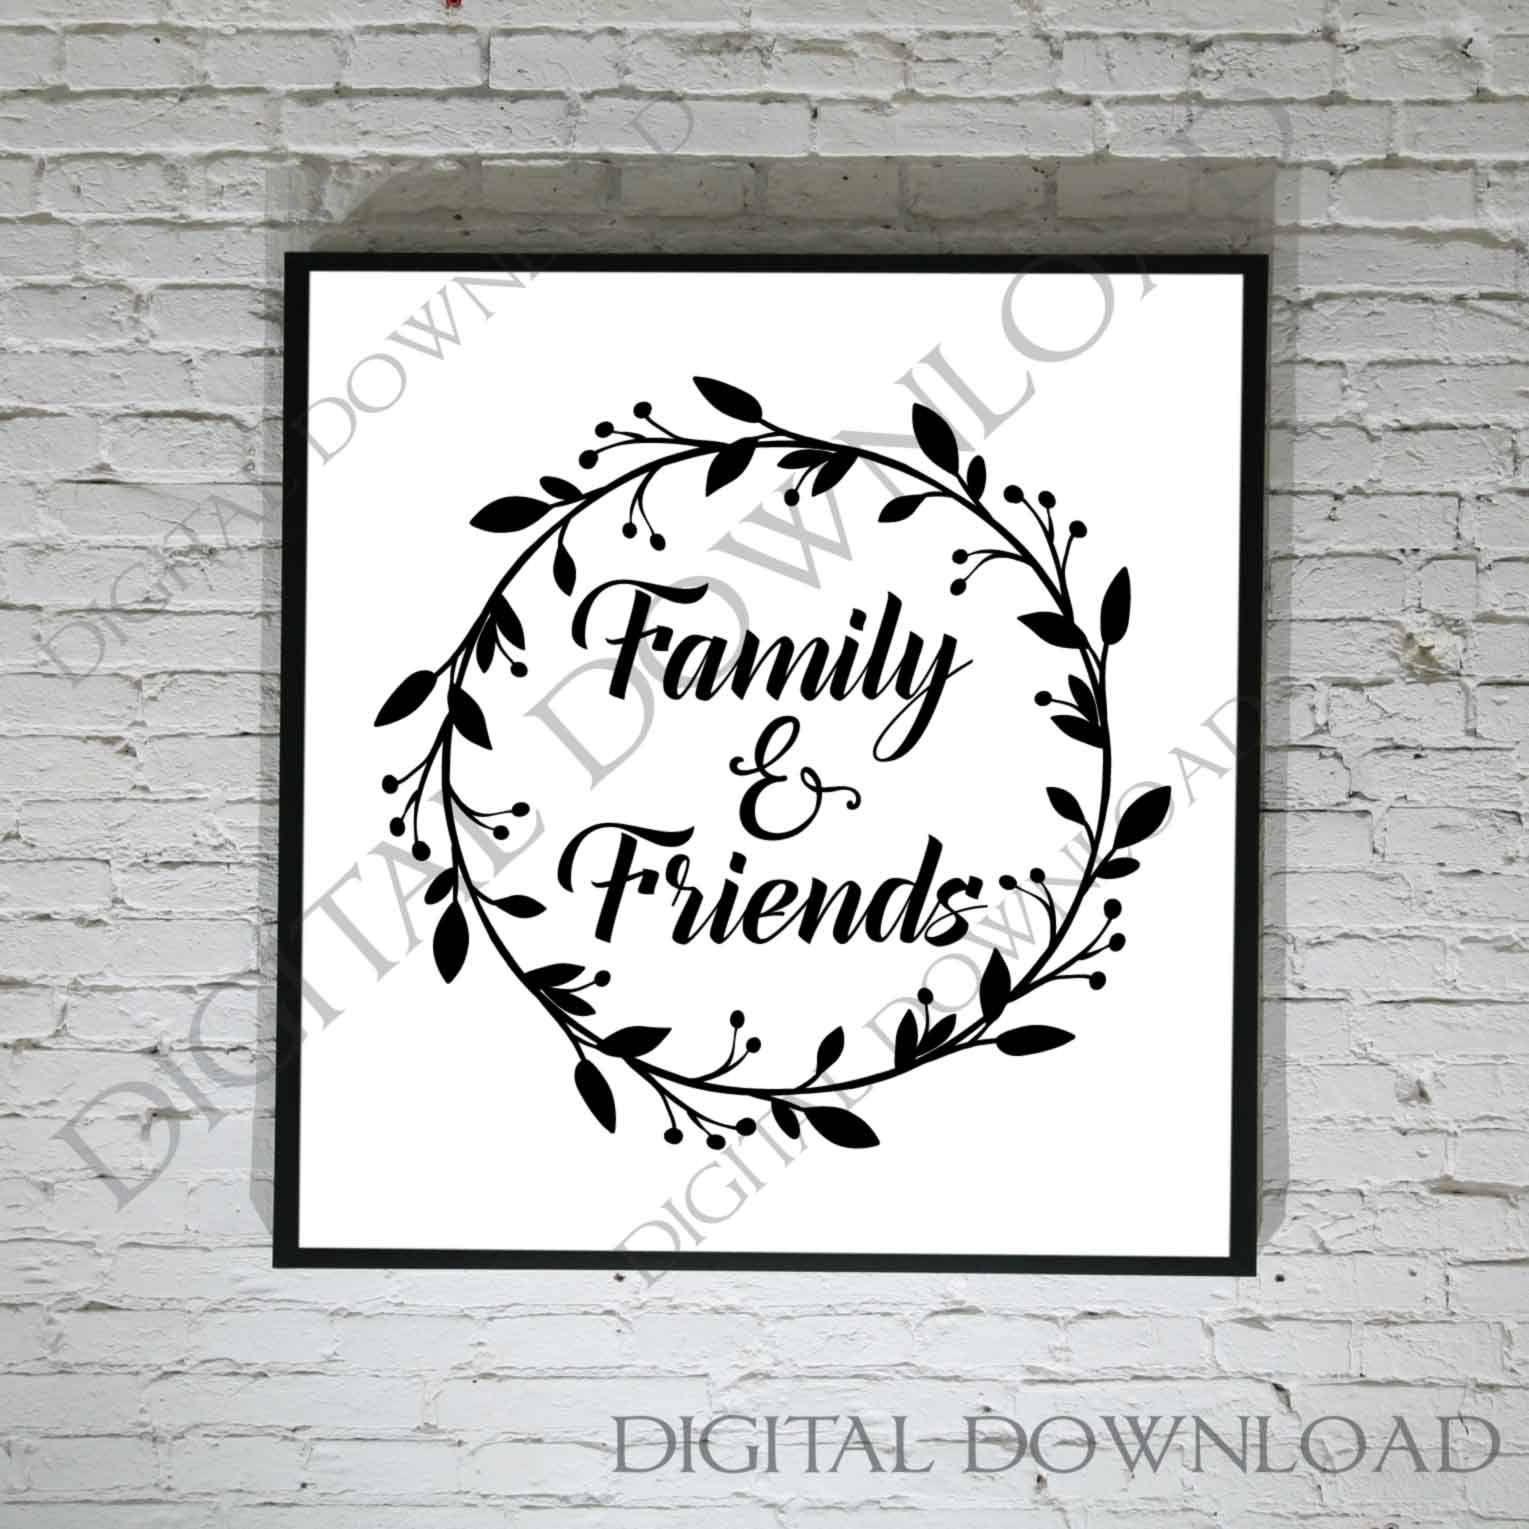 Family u friends svg vector vinyl print download quote printable